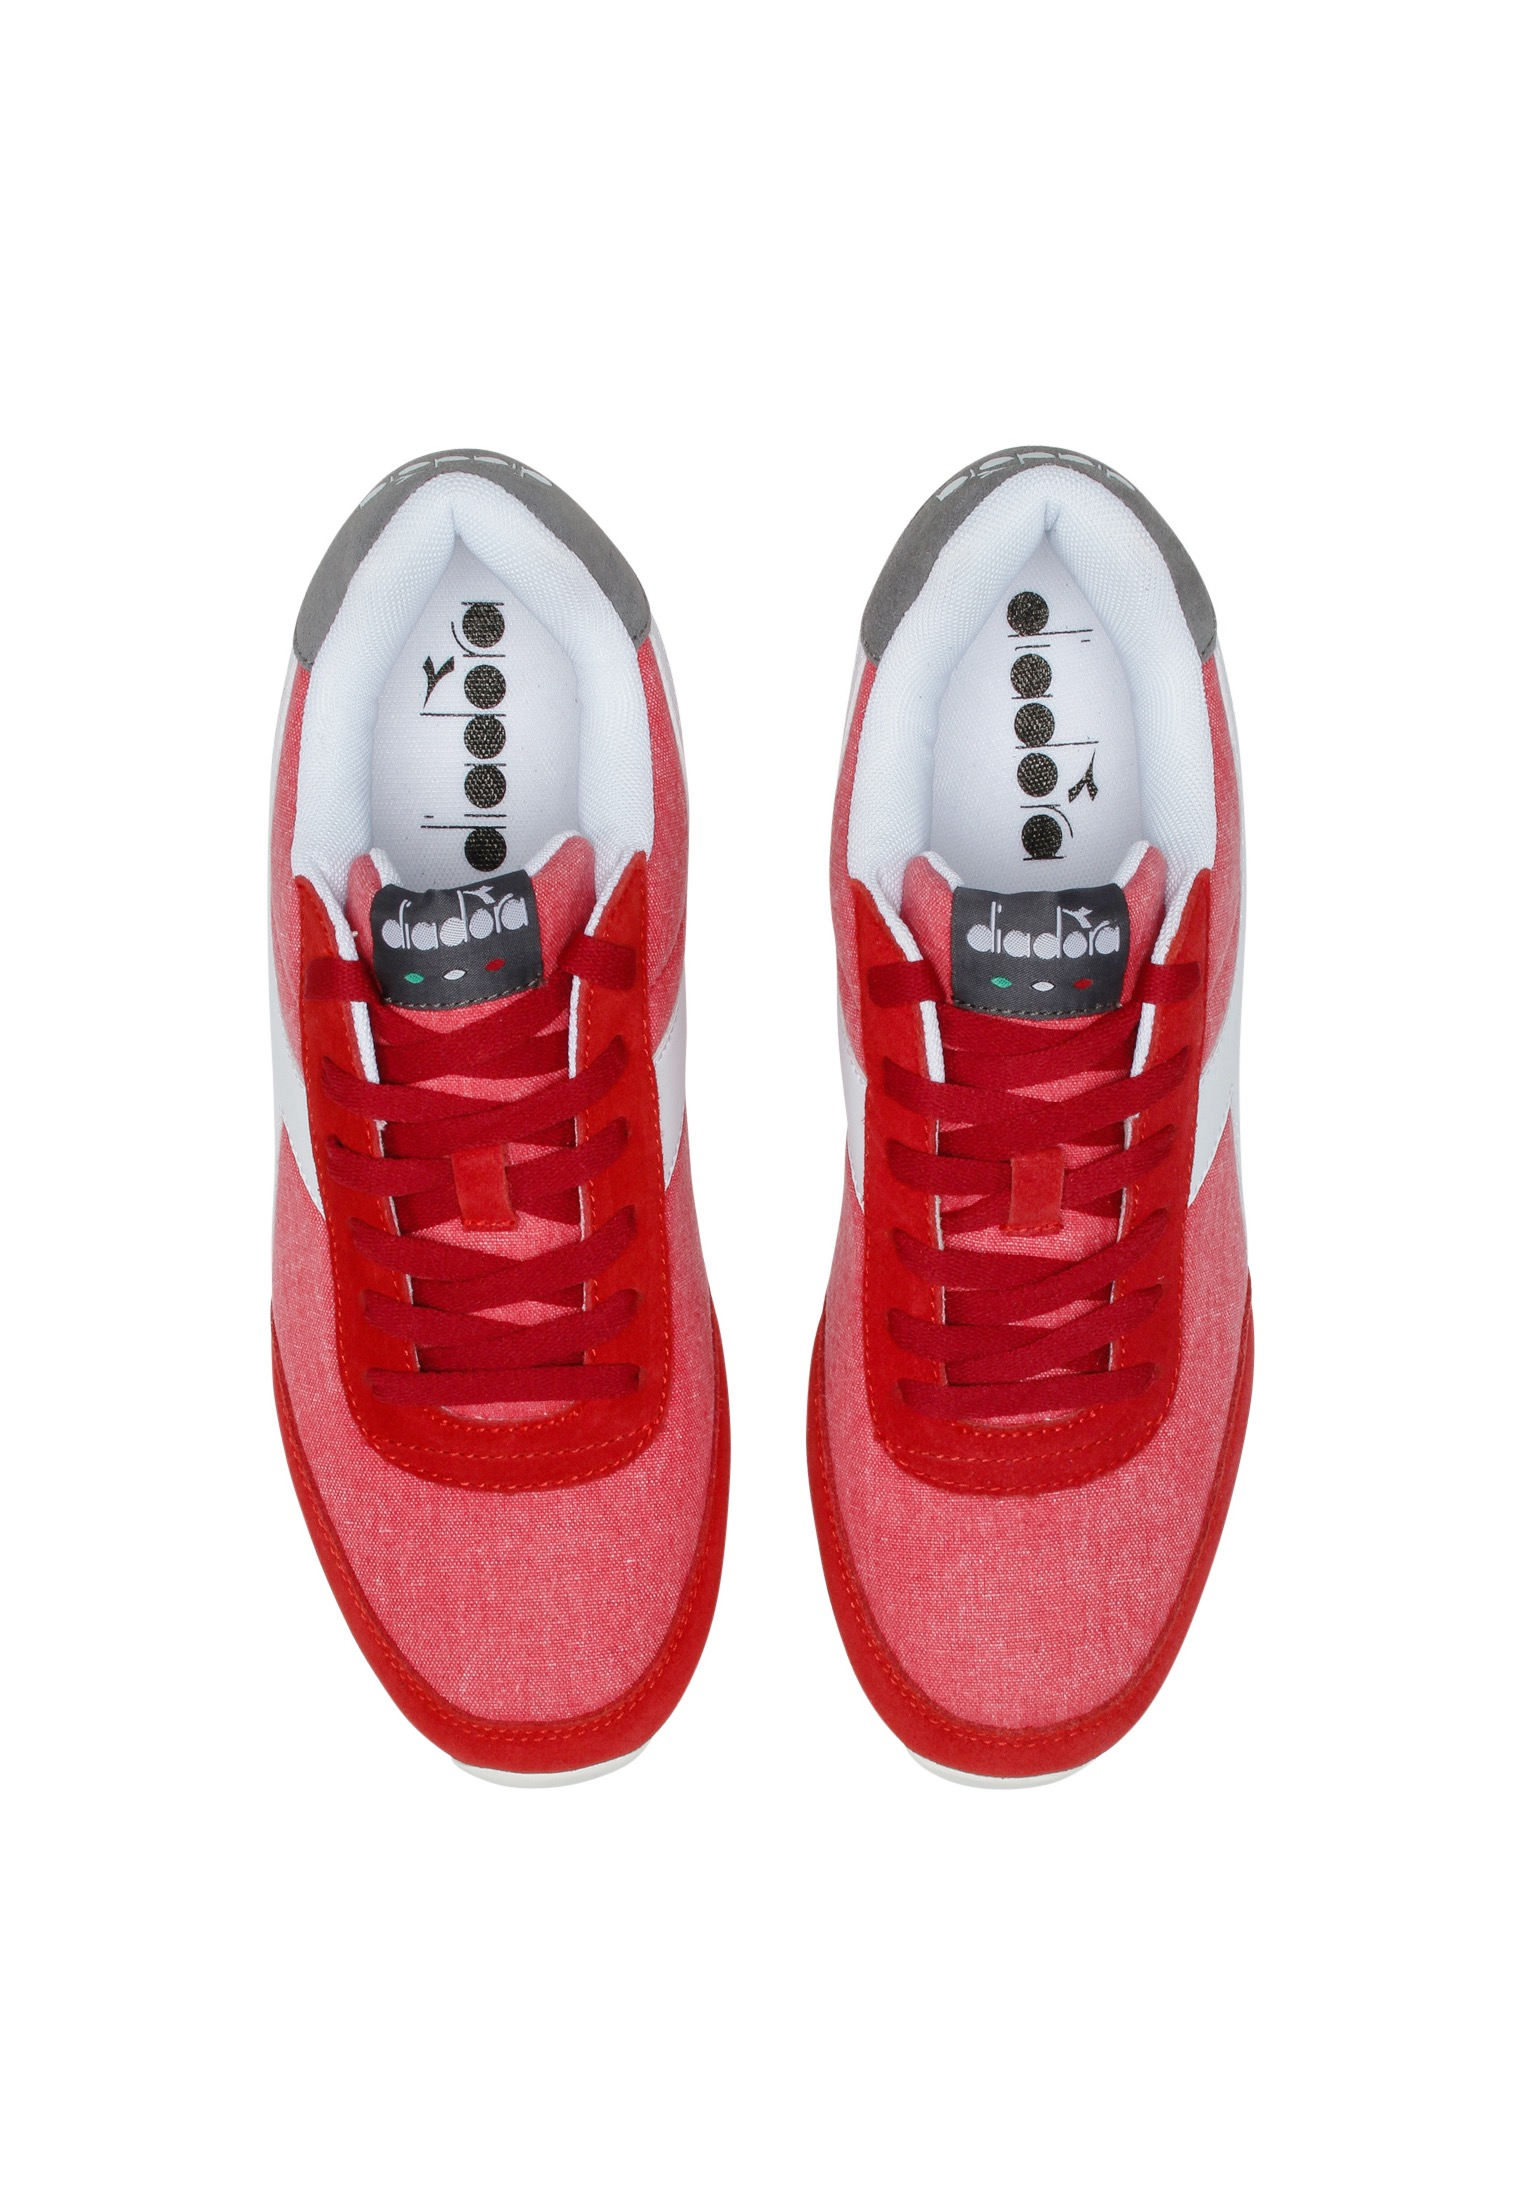 Scarpe-Diadora-Jog-Light-C-Sneakers-sportive-uomo-donna-vari-colori-e-taglie miniatura 90